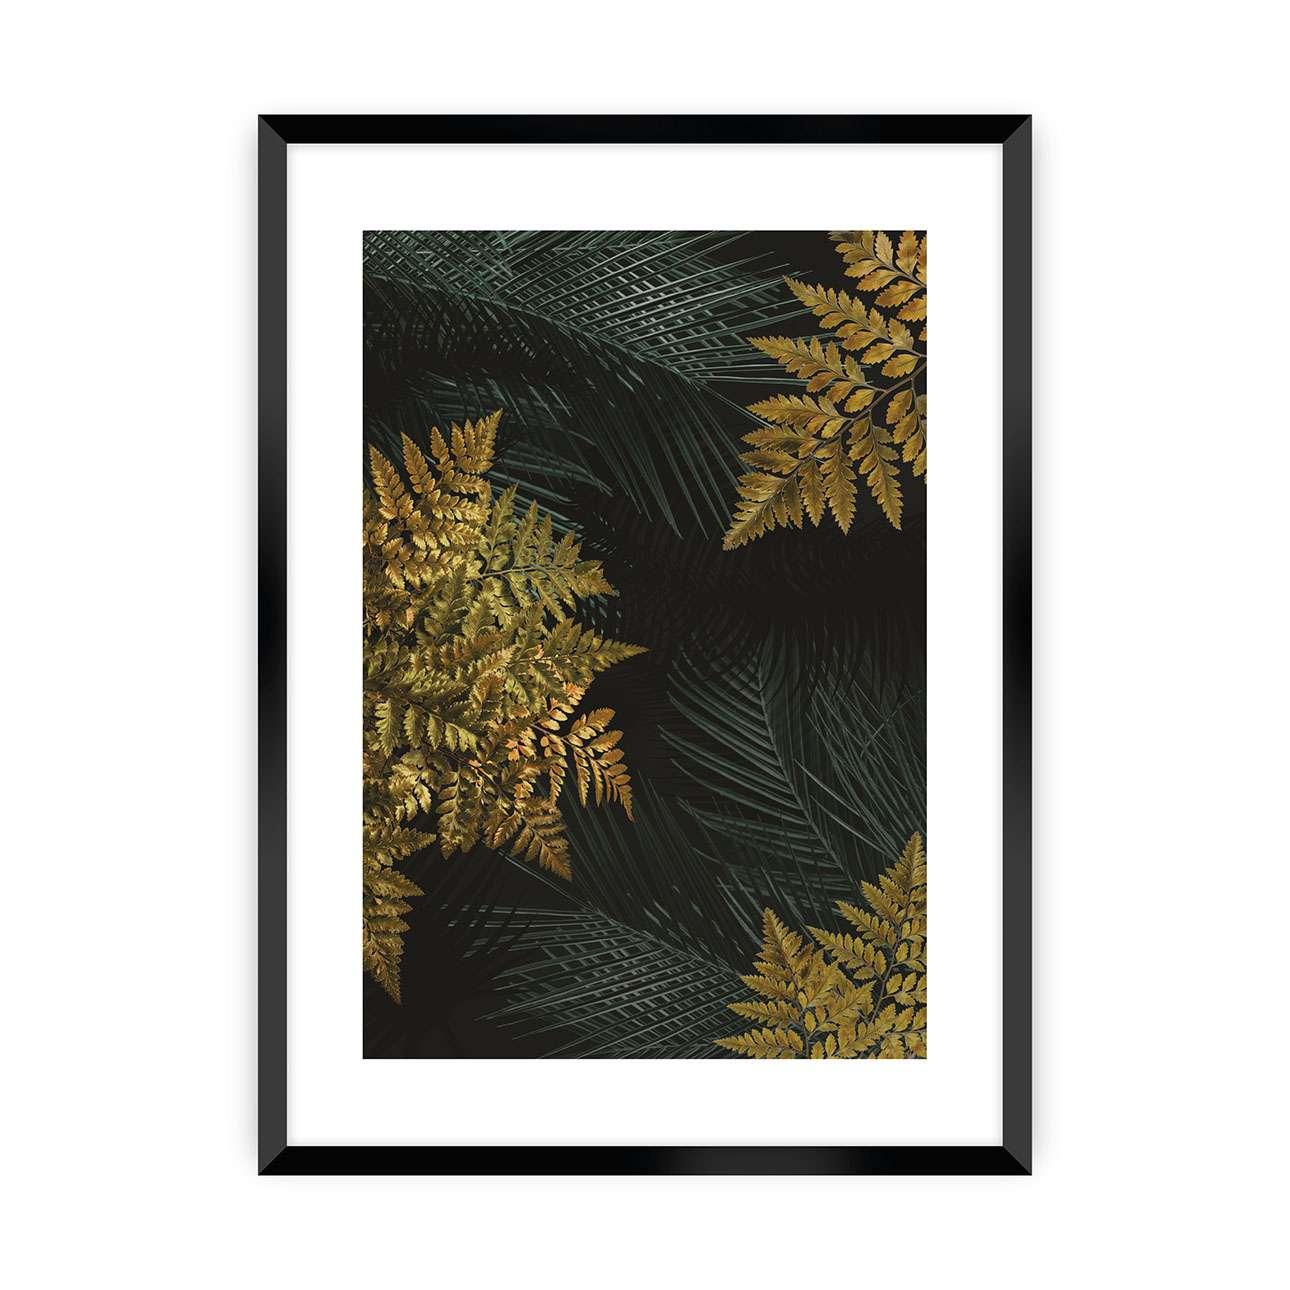 Poster Golden Leaves II, 70 x 100 cm, Ramka: Czarna günstig online kaufen